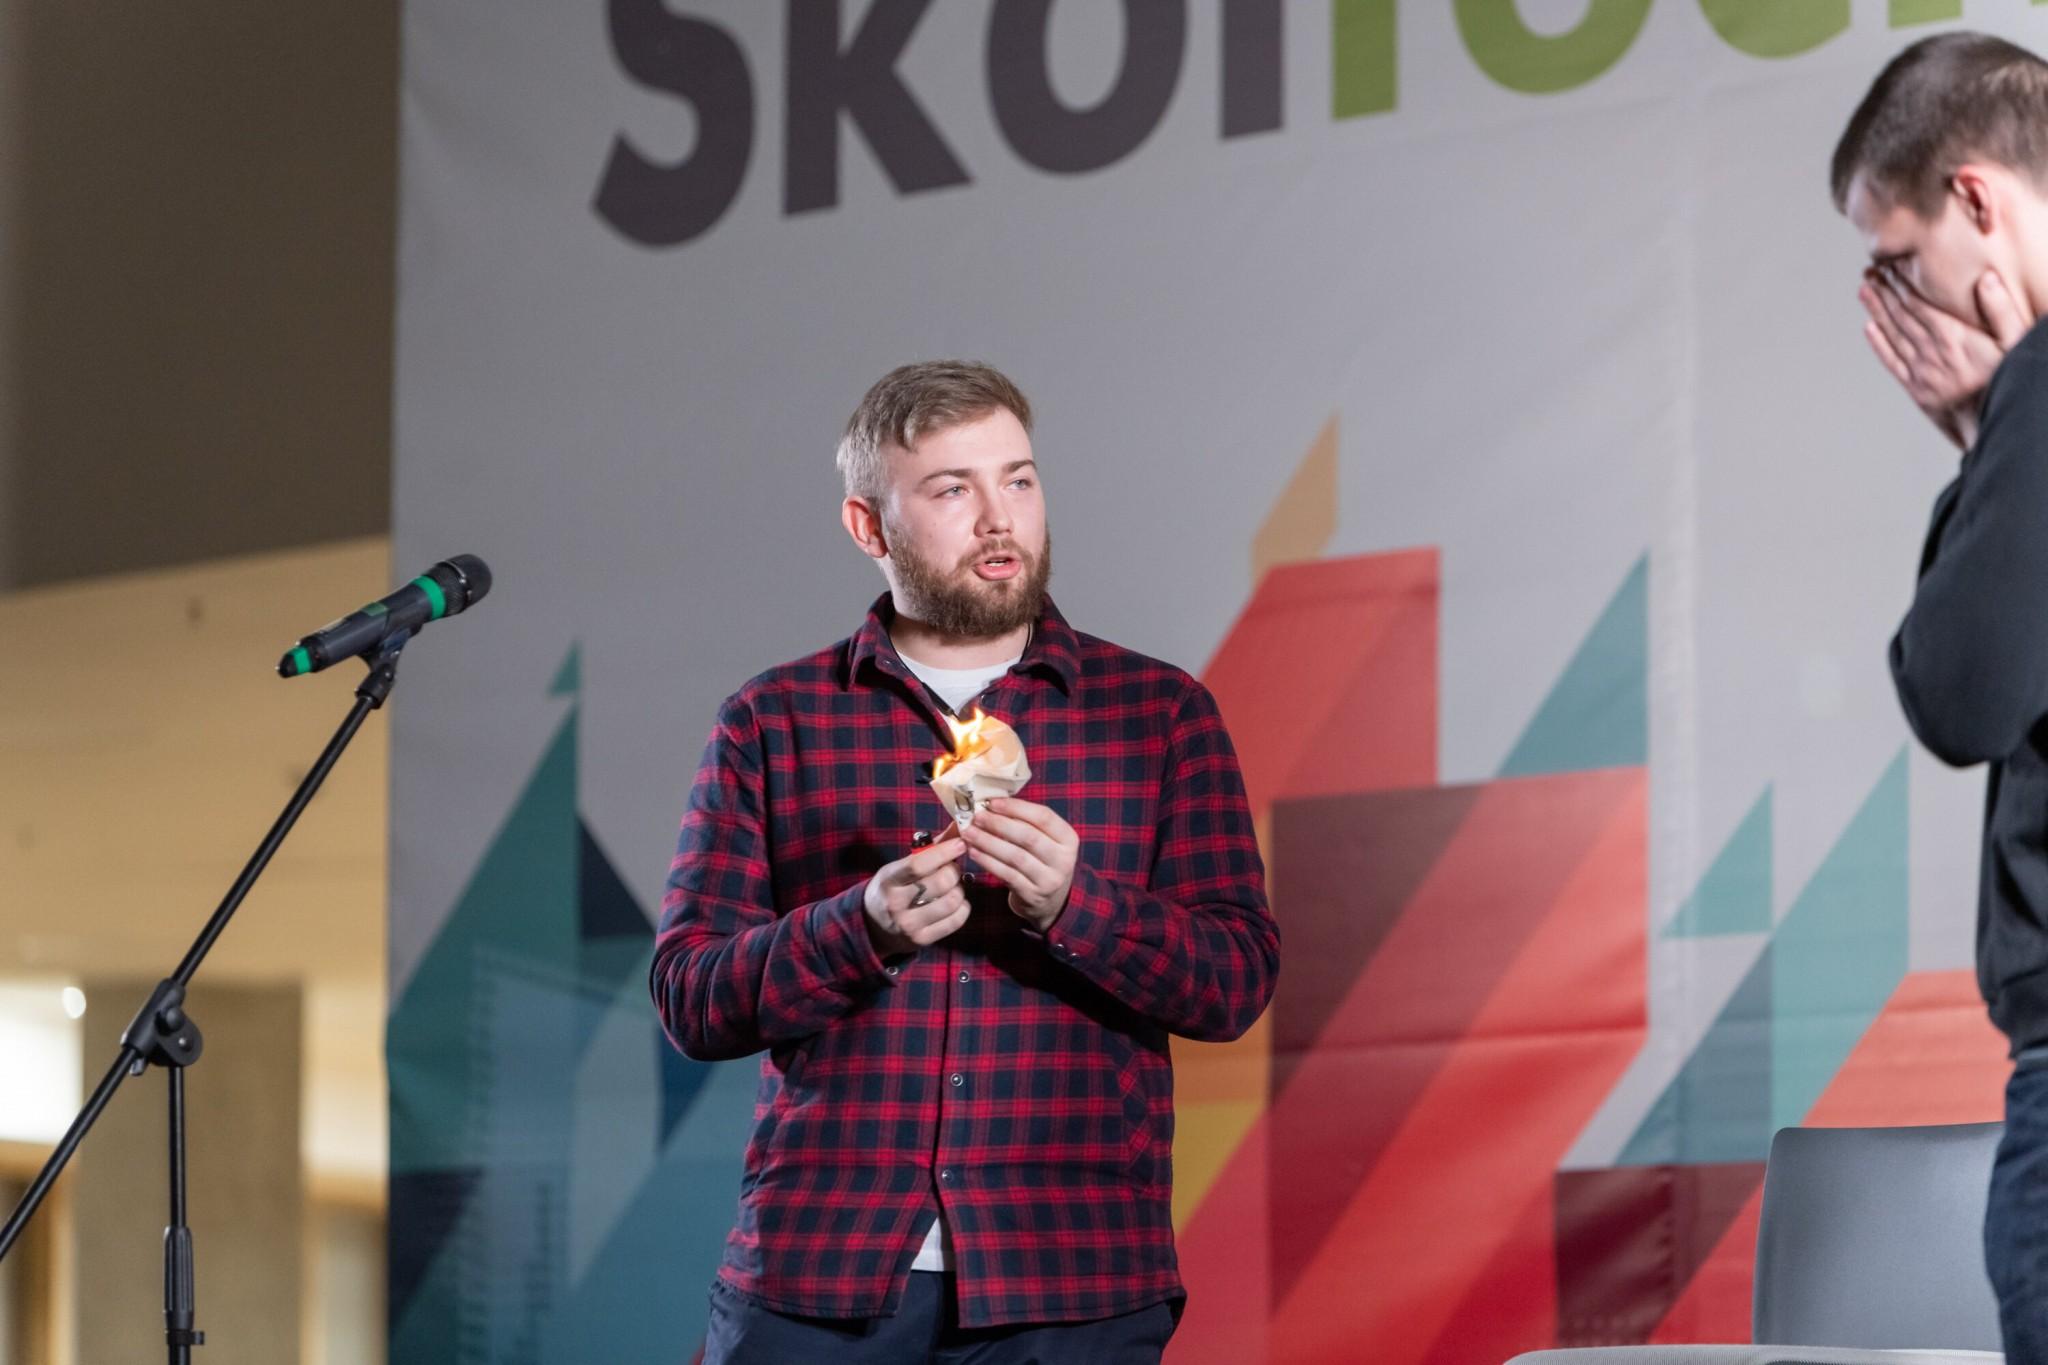 Image: Vladislav Panov (Magician), third place winner